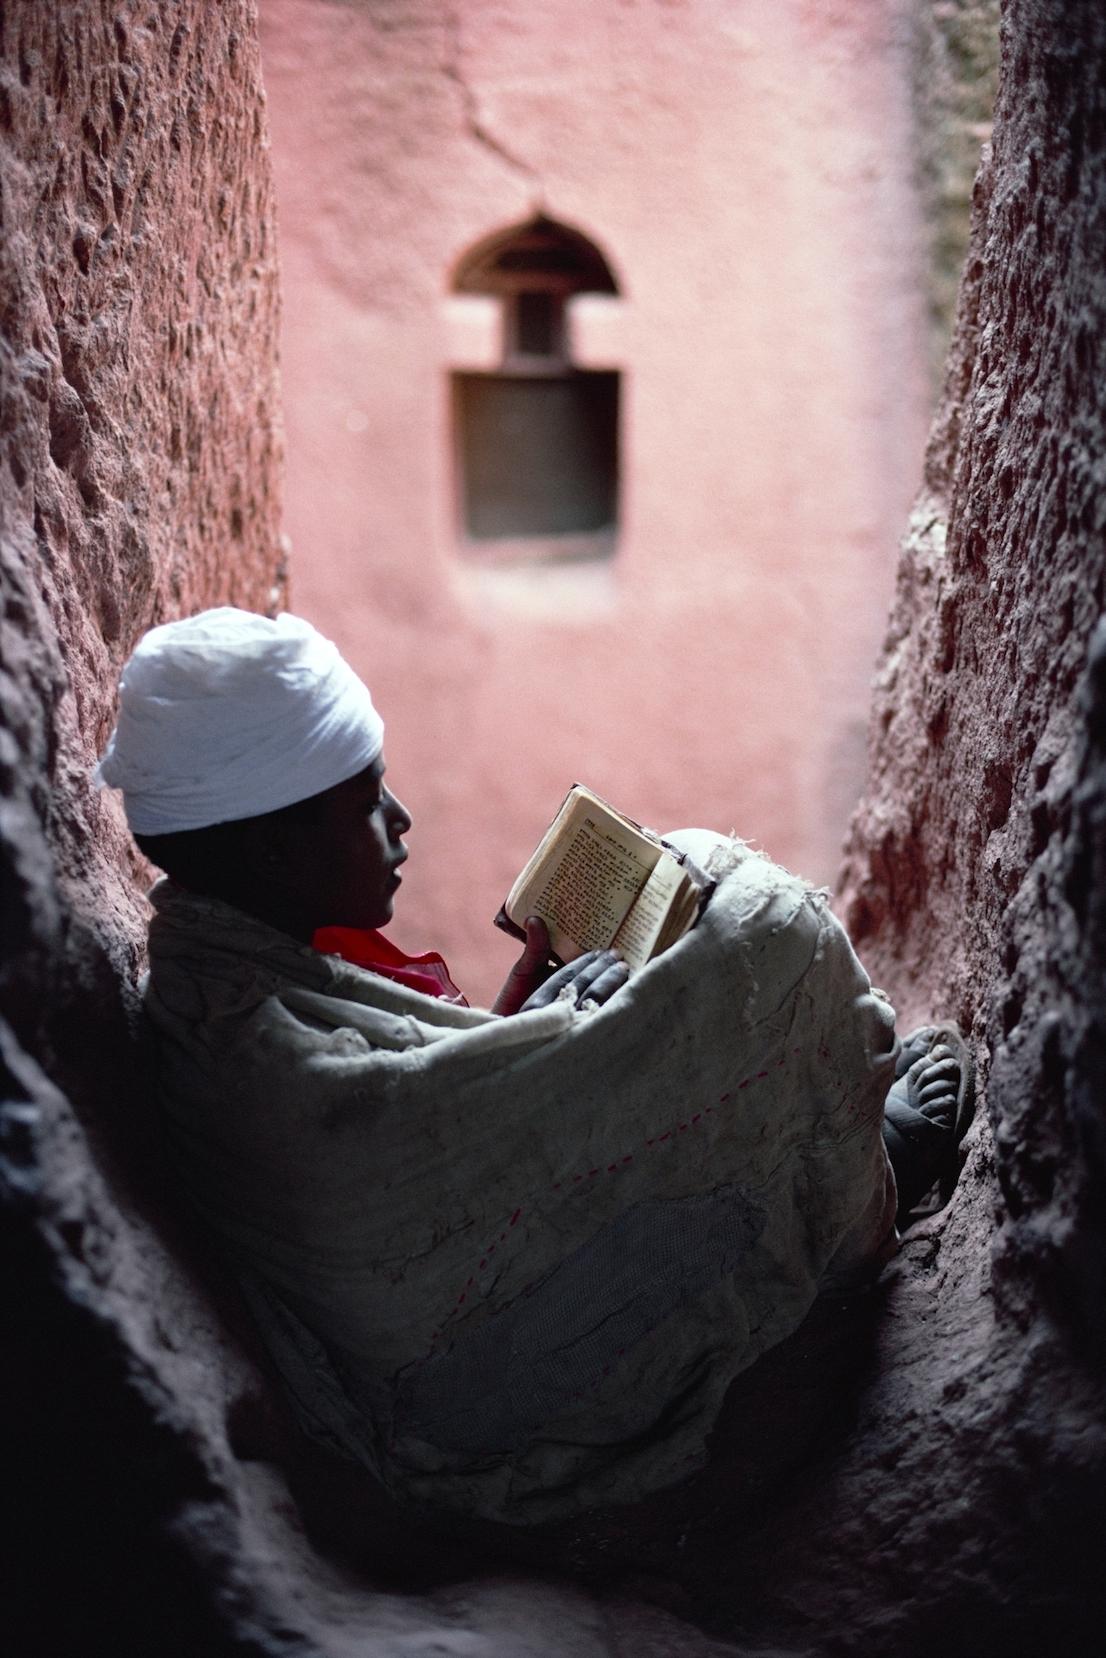 Foto di Kazuyoshi Nomachi. Un giovane diacono legge la Sacra Bibbia Lalibela, Etiopia ,1997.